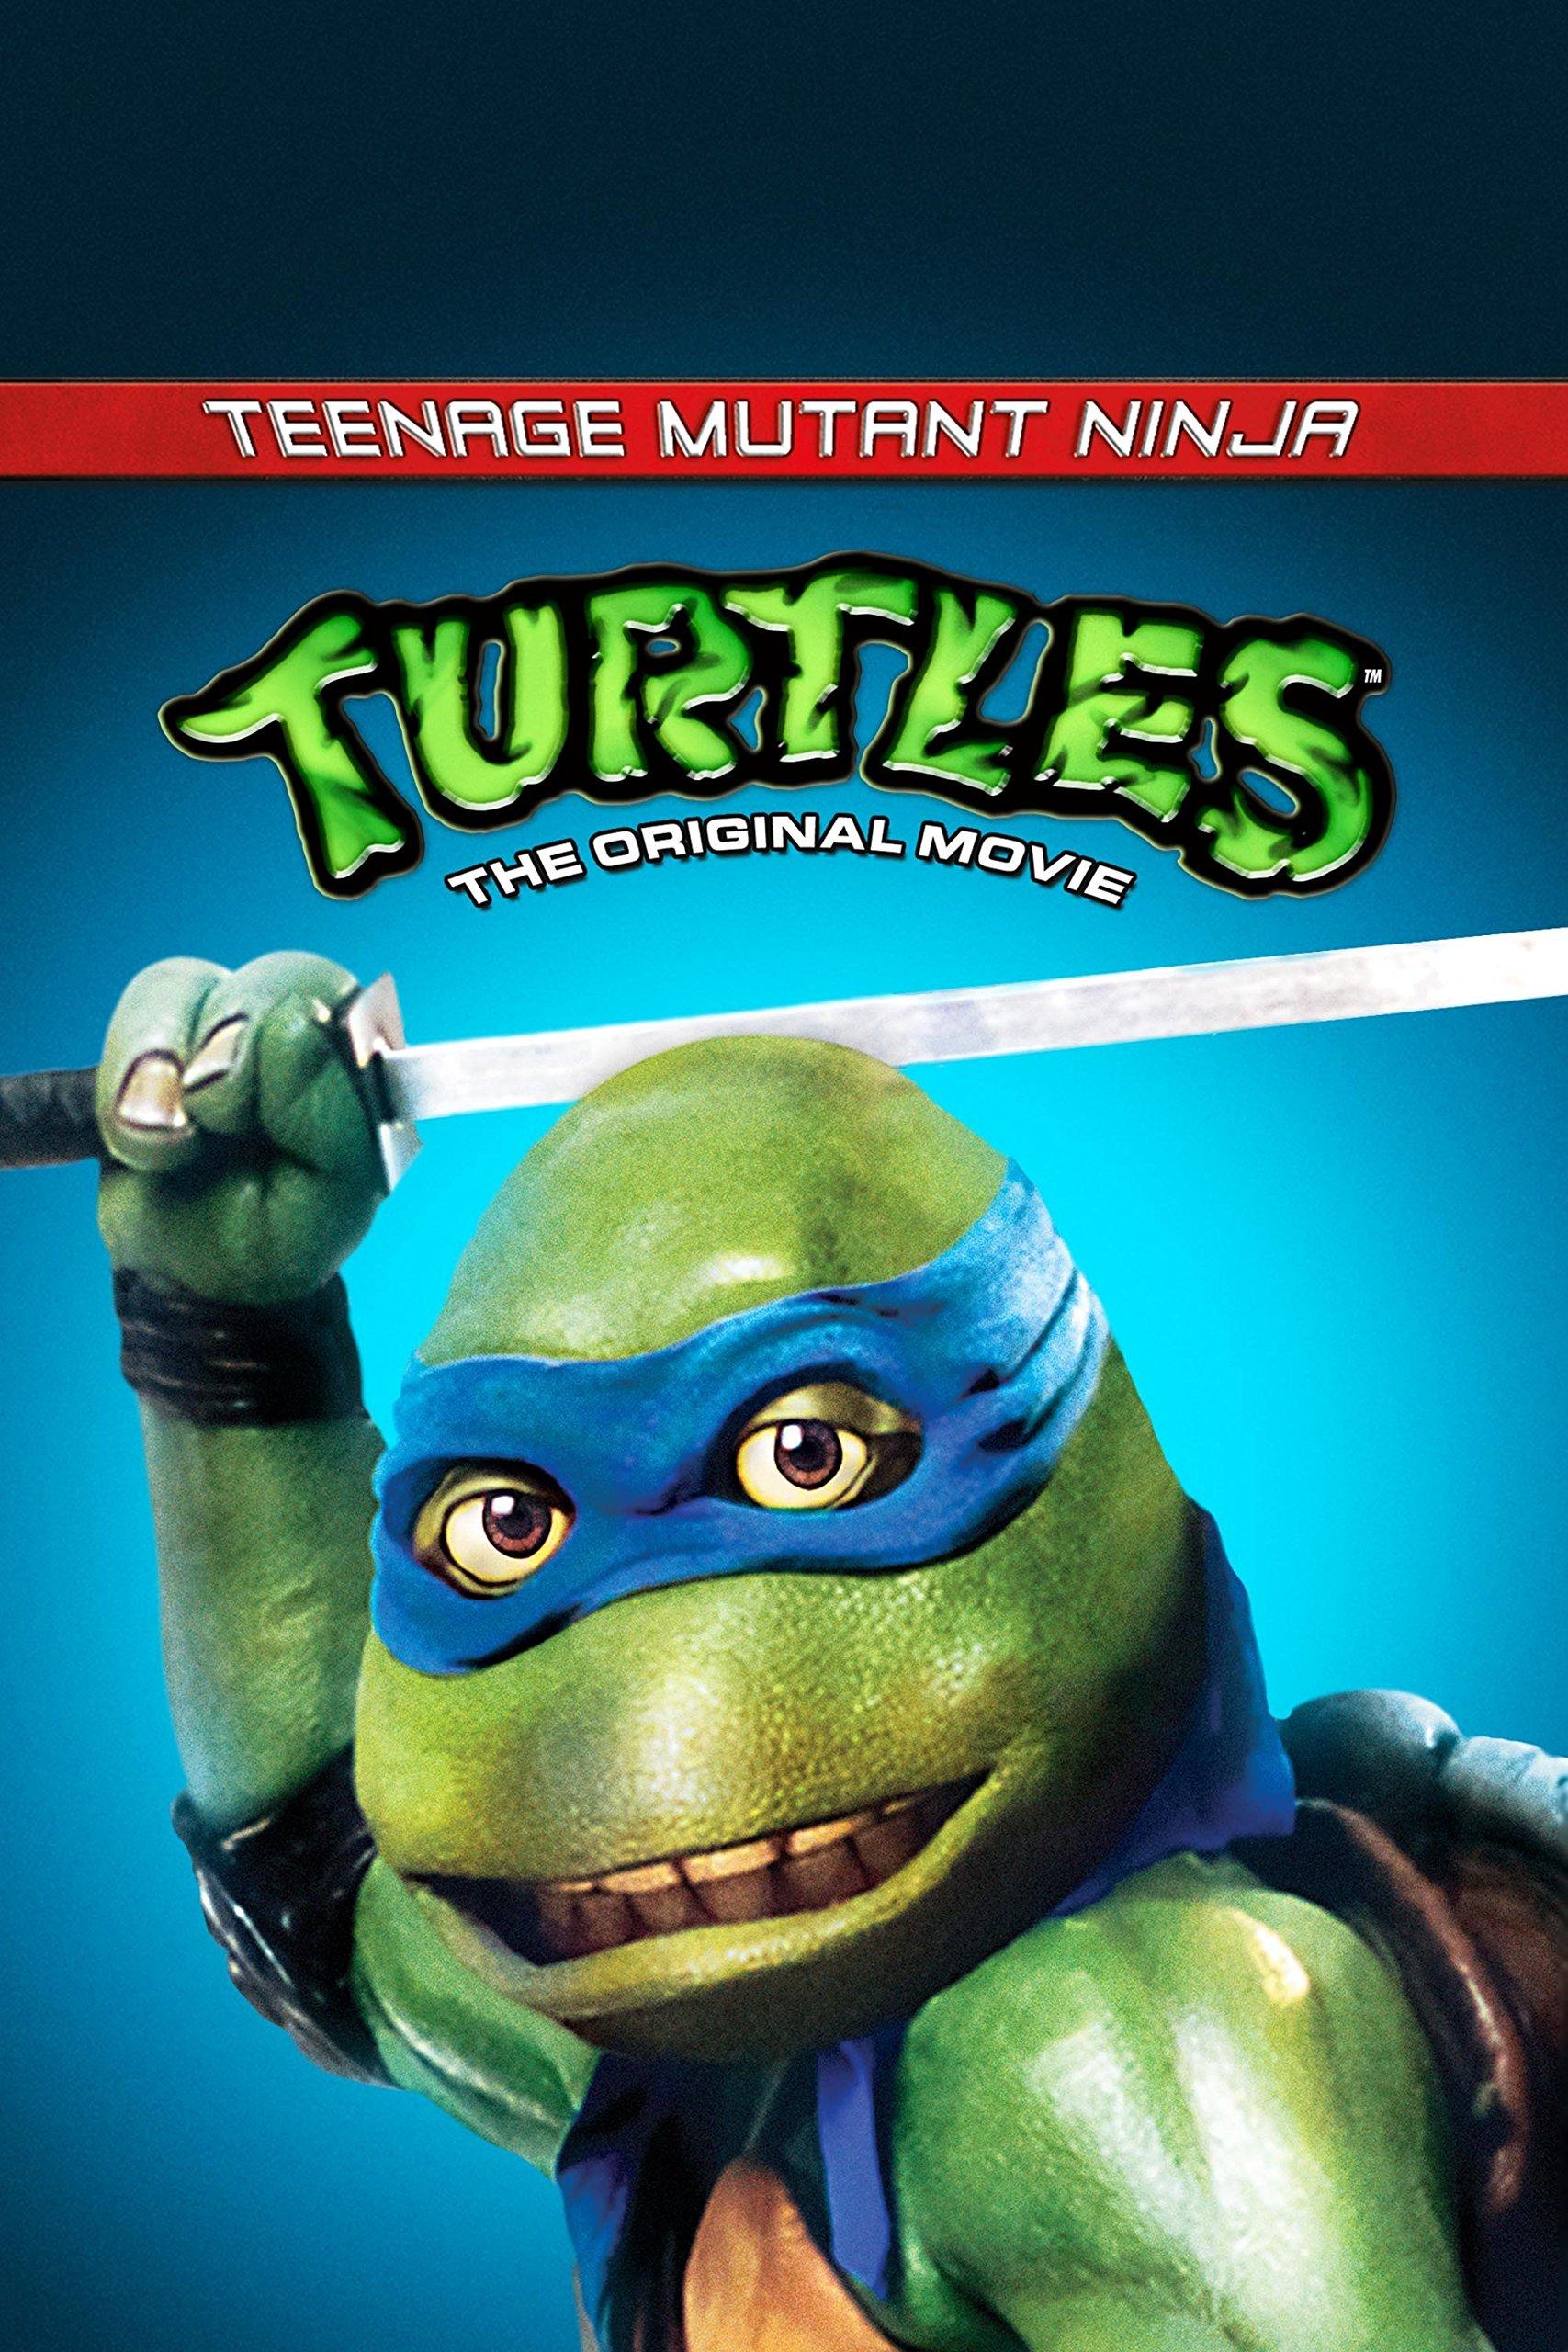 amazon com watch teenage mutant ninja turtles prime video rh amazon com